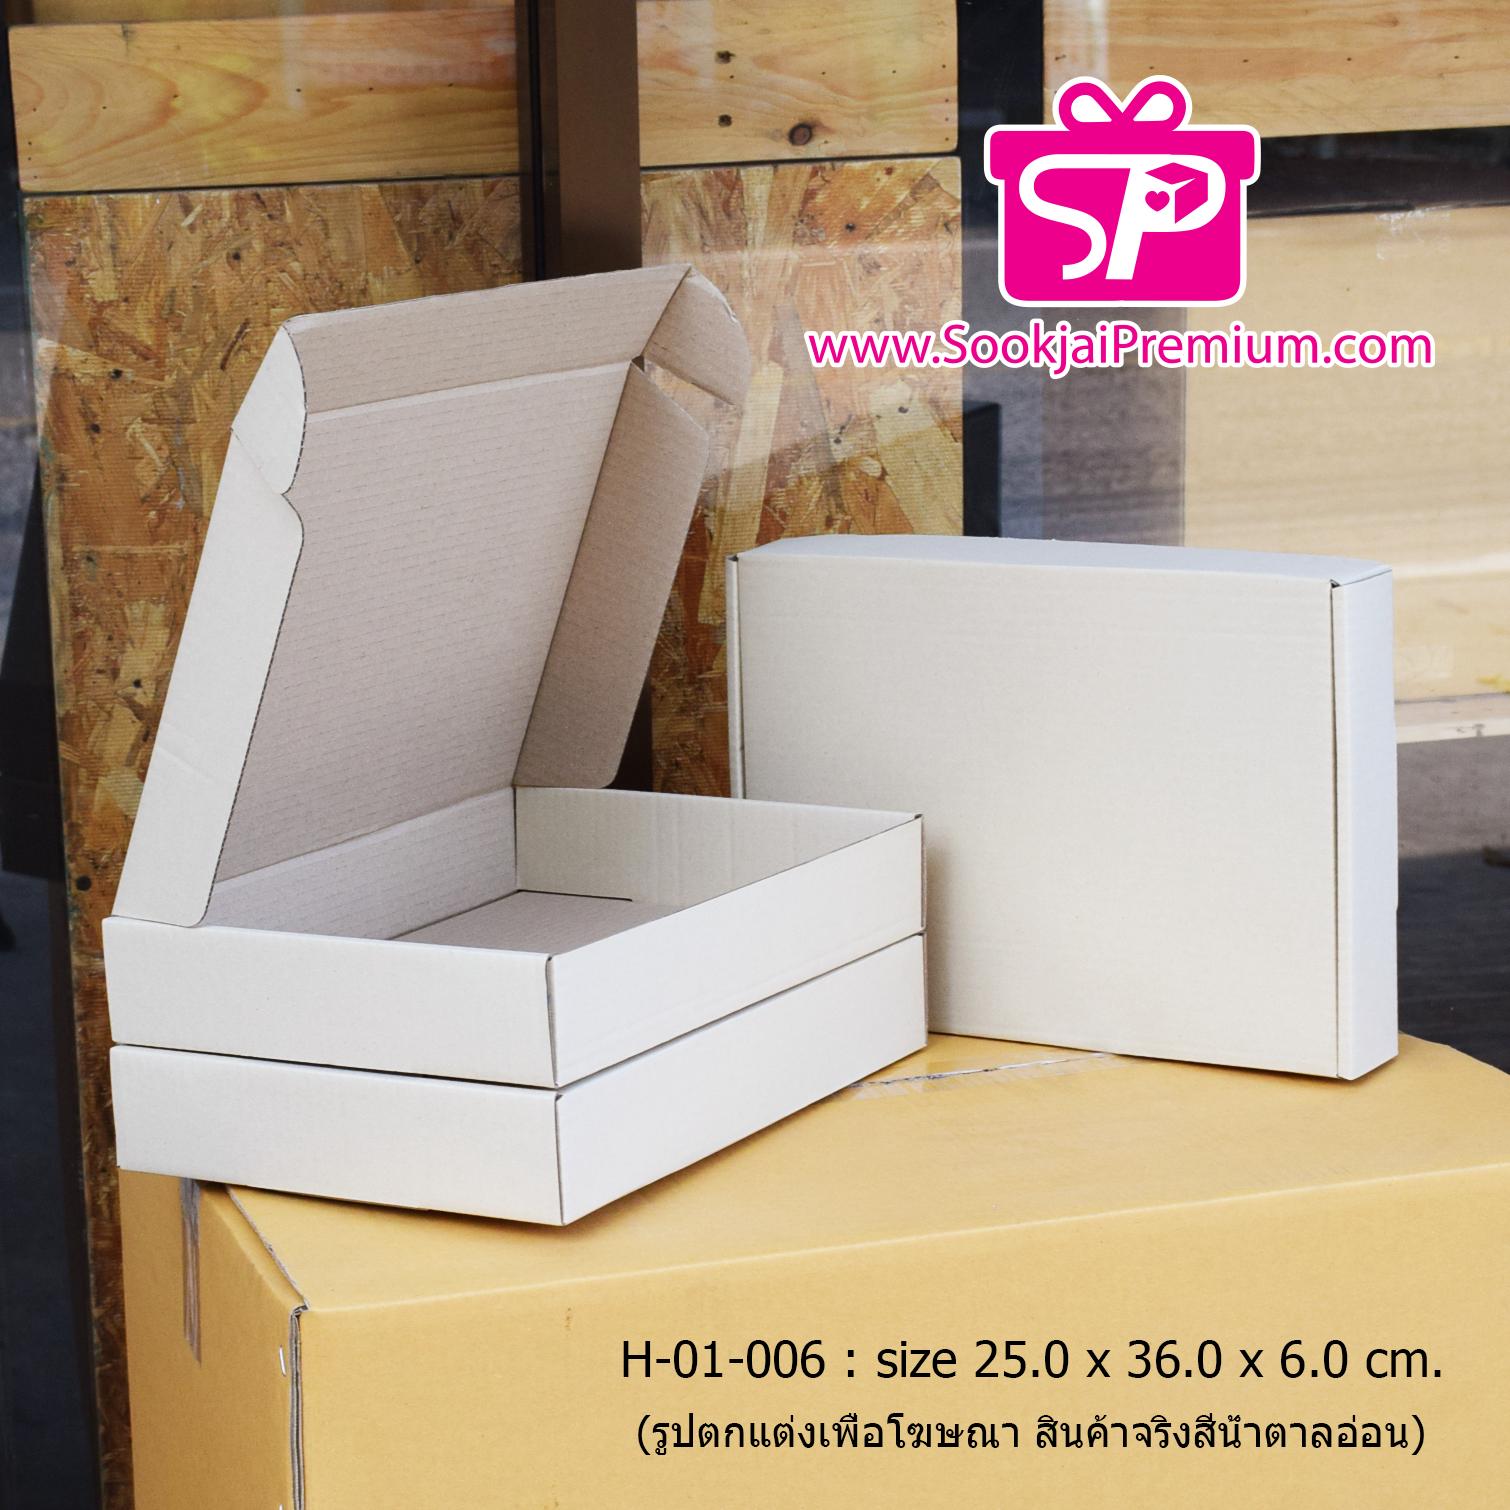 H-01-006 : กล่องลูกฟูกทรงหูช้าง ขนาด 25.0 x 36.0 x 6.0 ซม.